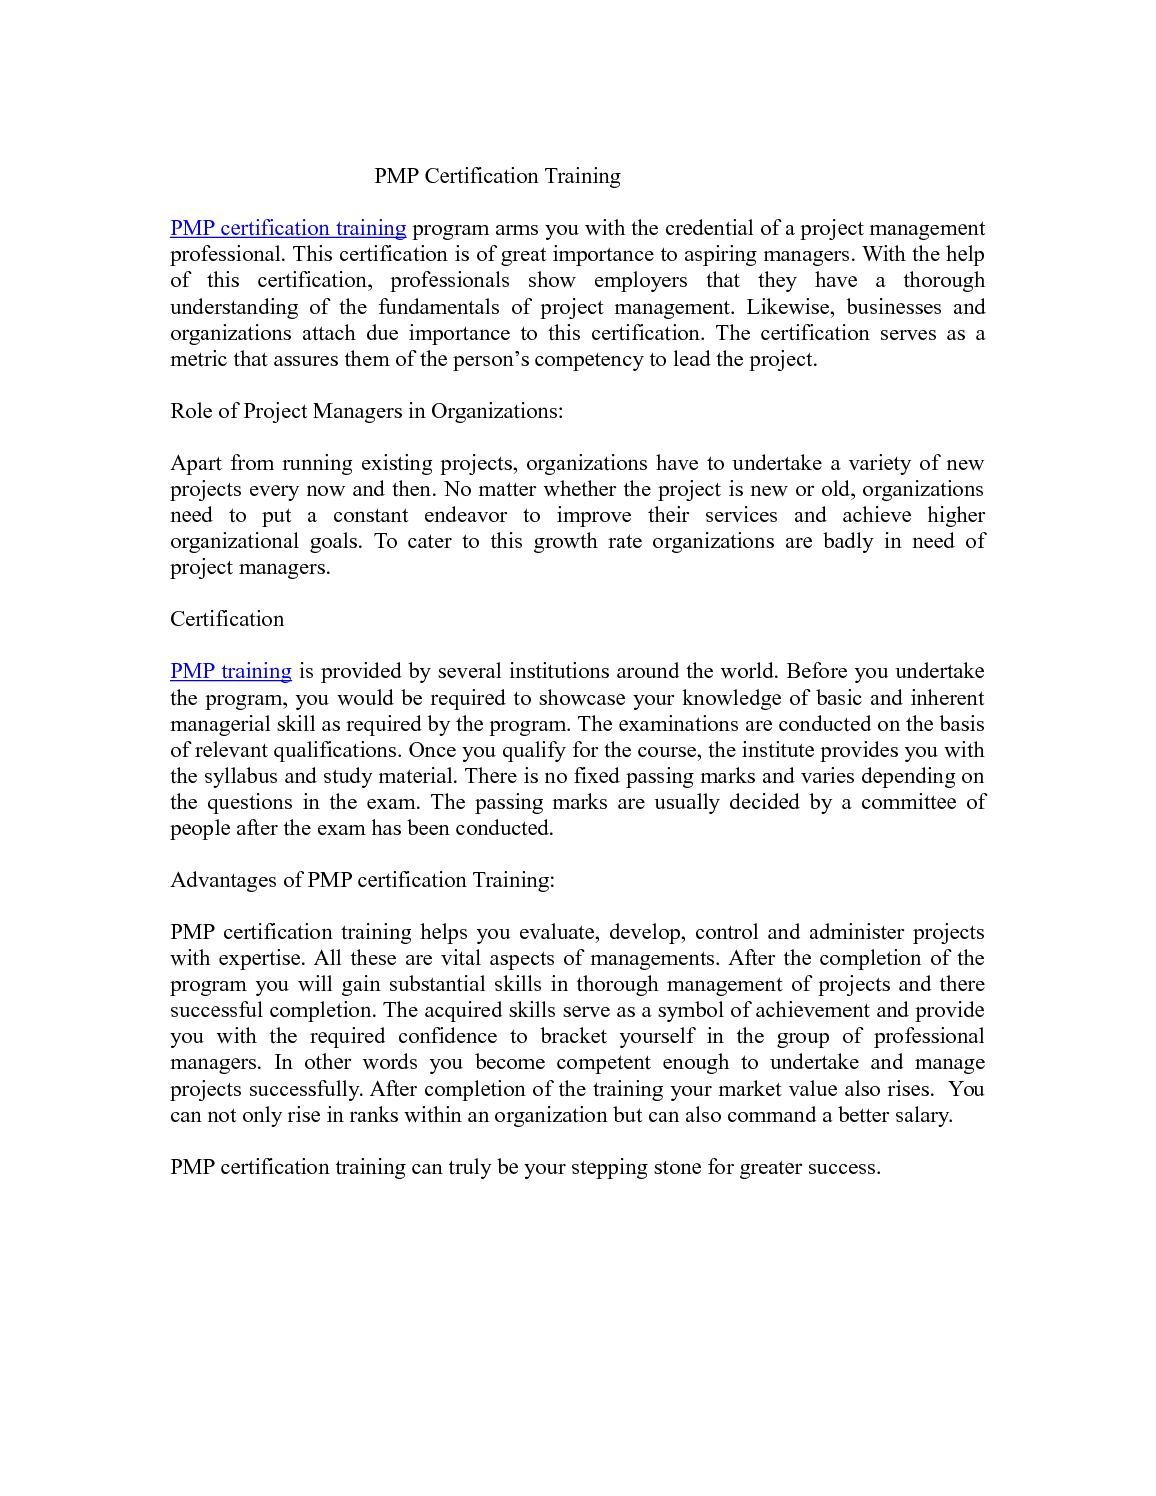 Calamo Pmp Certification Training